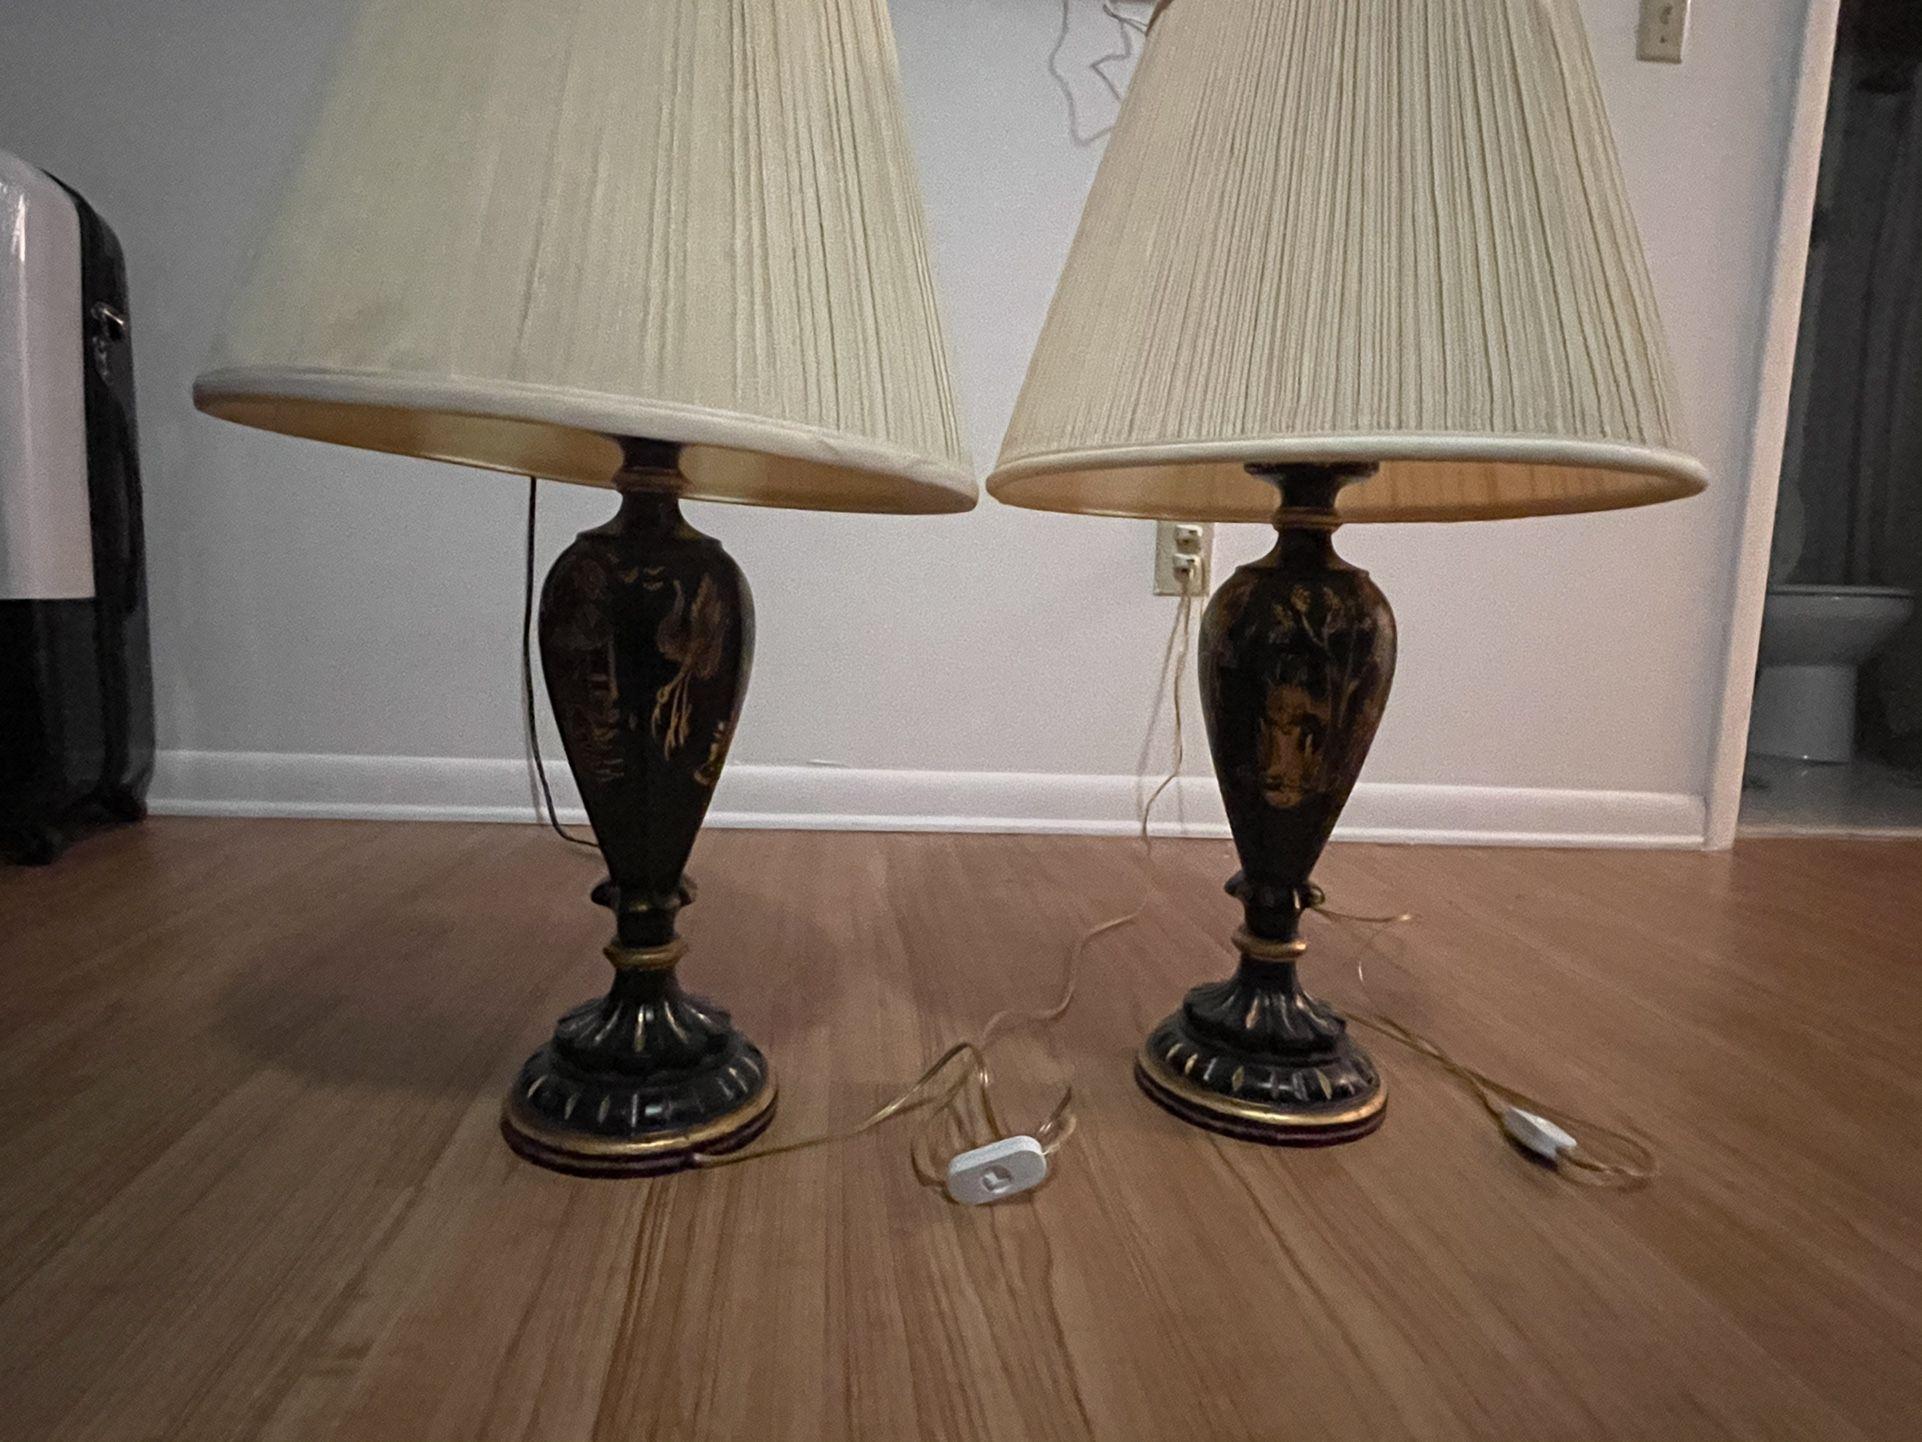 Antique japanese lamps